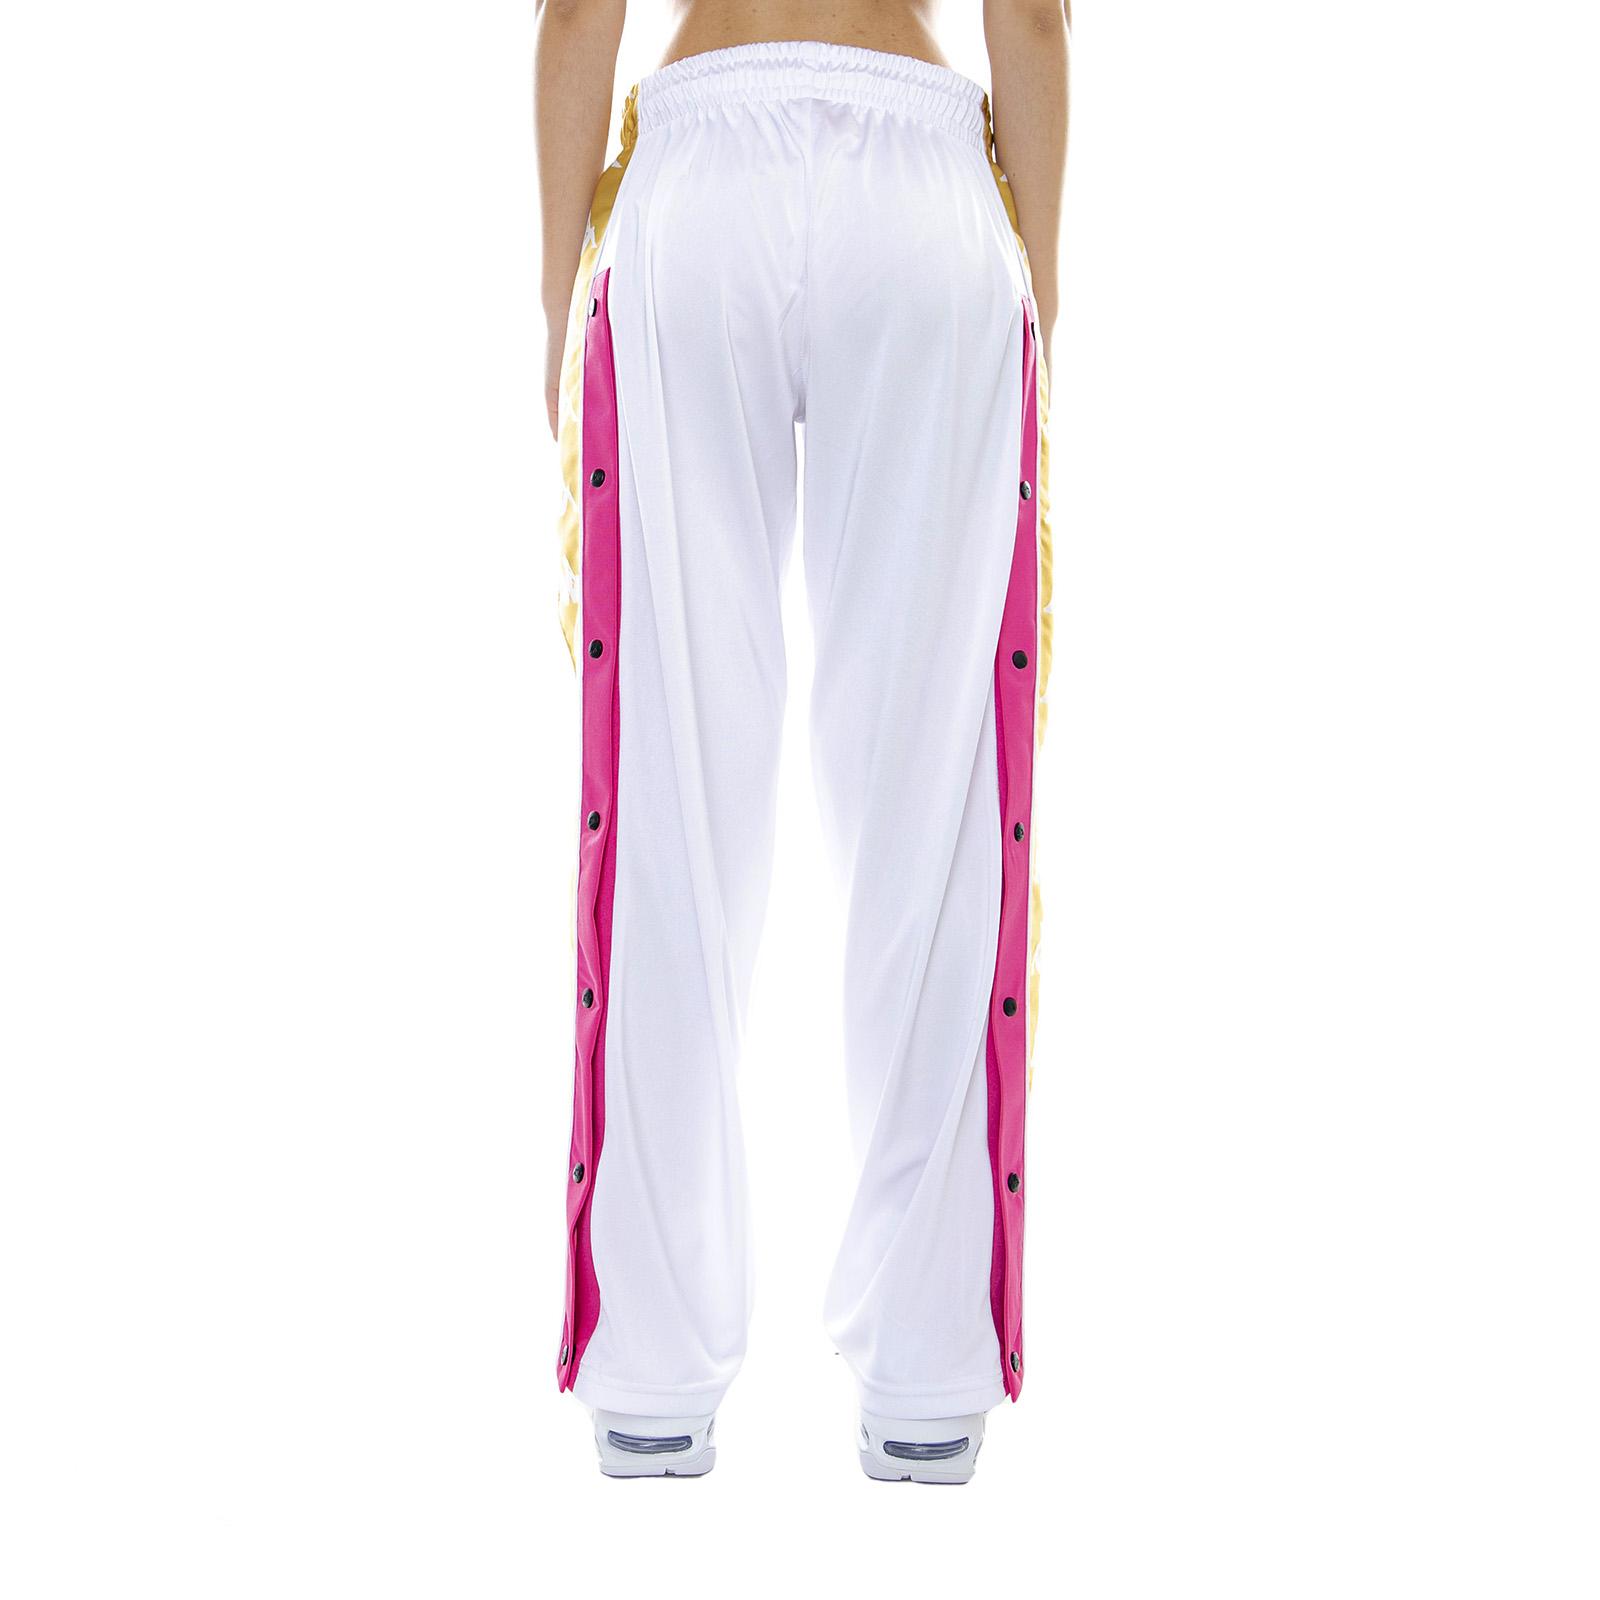 ae4ef007b674 Kappa 222 Banda Baish White/Fuchsia/Yellow - Pantaloni Sportivi Da Donna  Bianco 3 3 di 4 ...